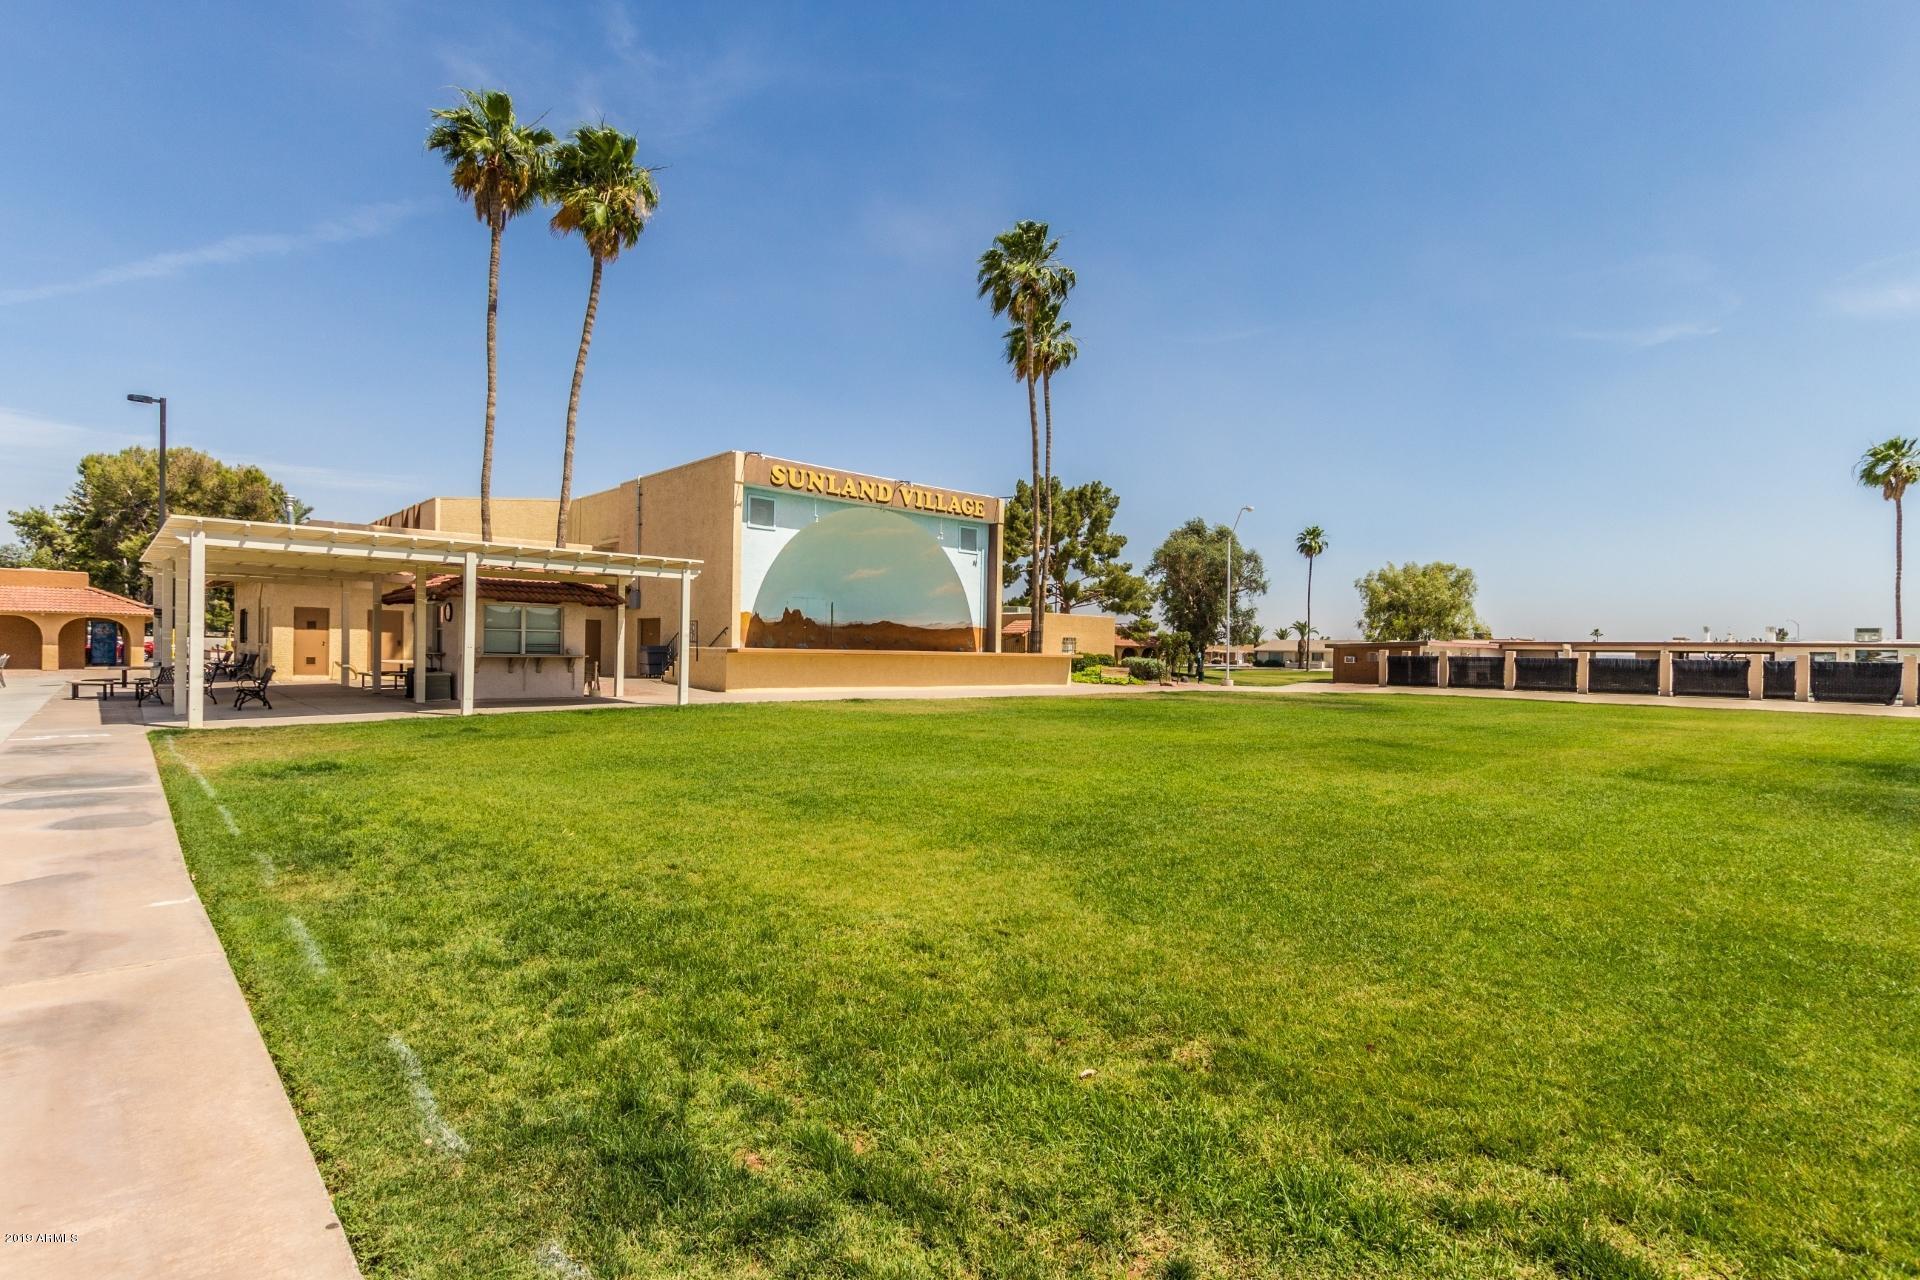 MLS 5867464 4565 E CLOVIS Avenue, Mesa, AZ 85206 Mesa AZ Sunland Village